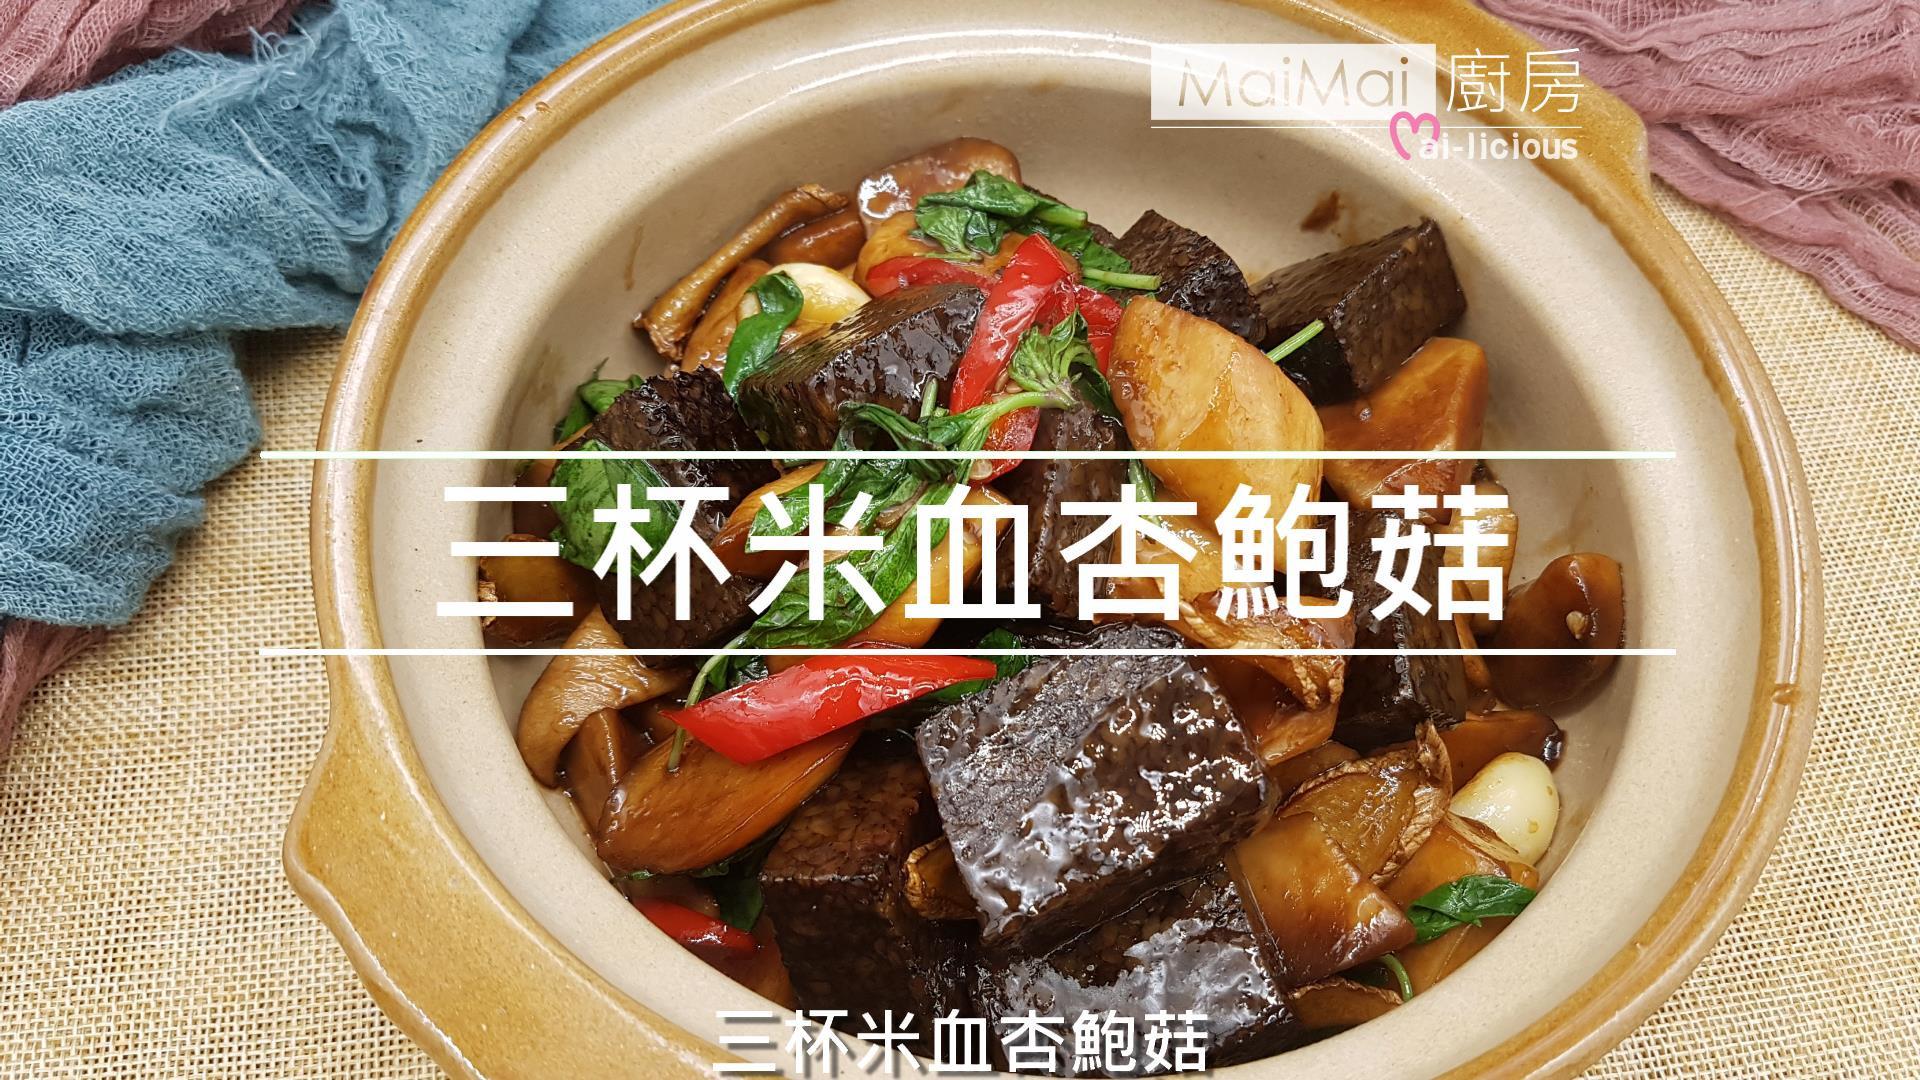 【MaiMai廚房】三杯米血杏鮑菇